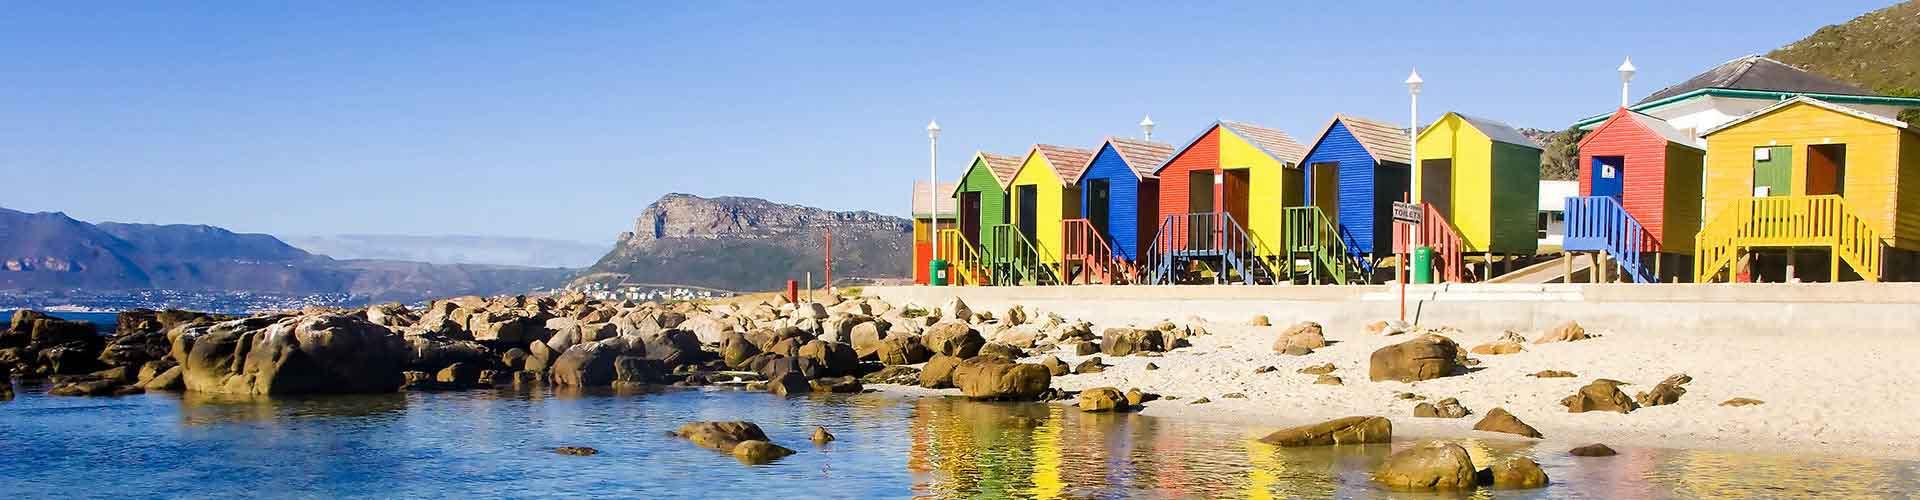 Kapkaupunki – Student accommodations, hostels and coworking spaces in Kapkaupunki (Etelä-Afrikka). Maps of Kapkaupunki, photos and reviews for each place in Kapkaupunki.